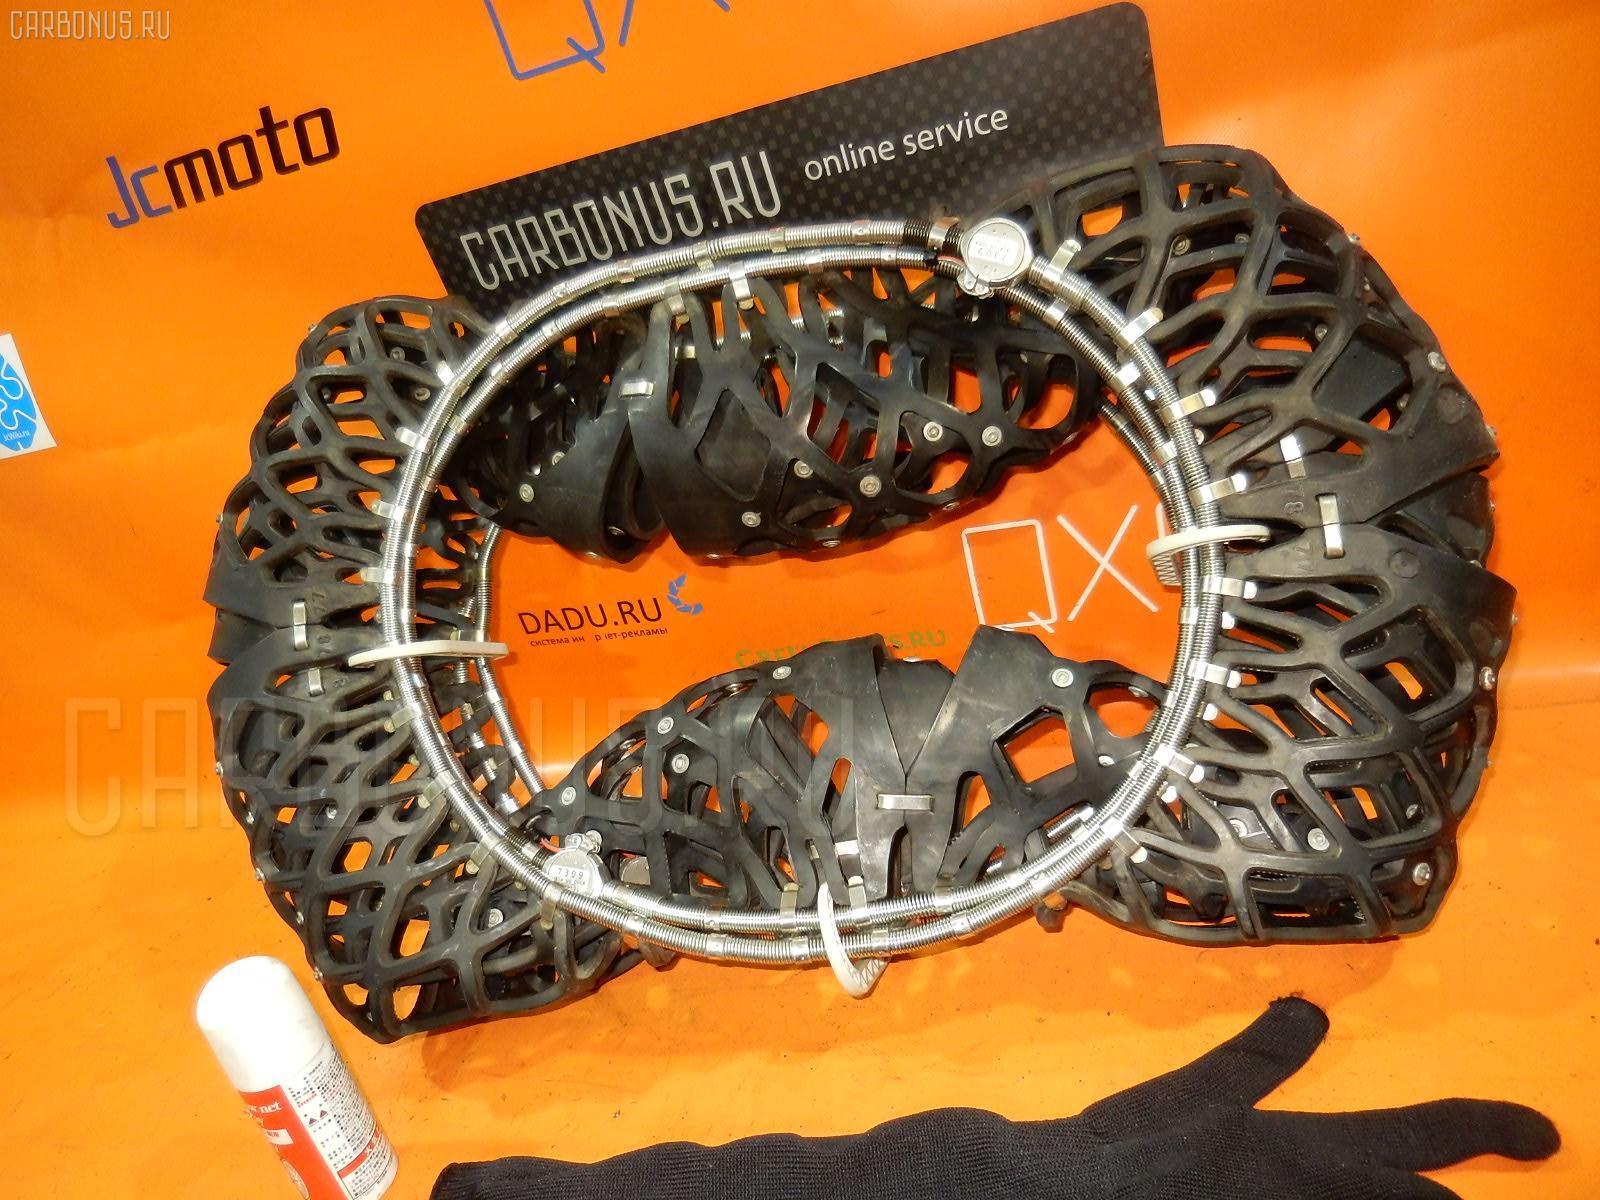 Цепь на колесо Фото 3